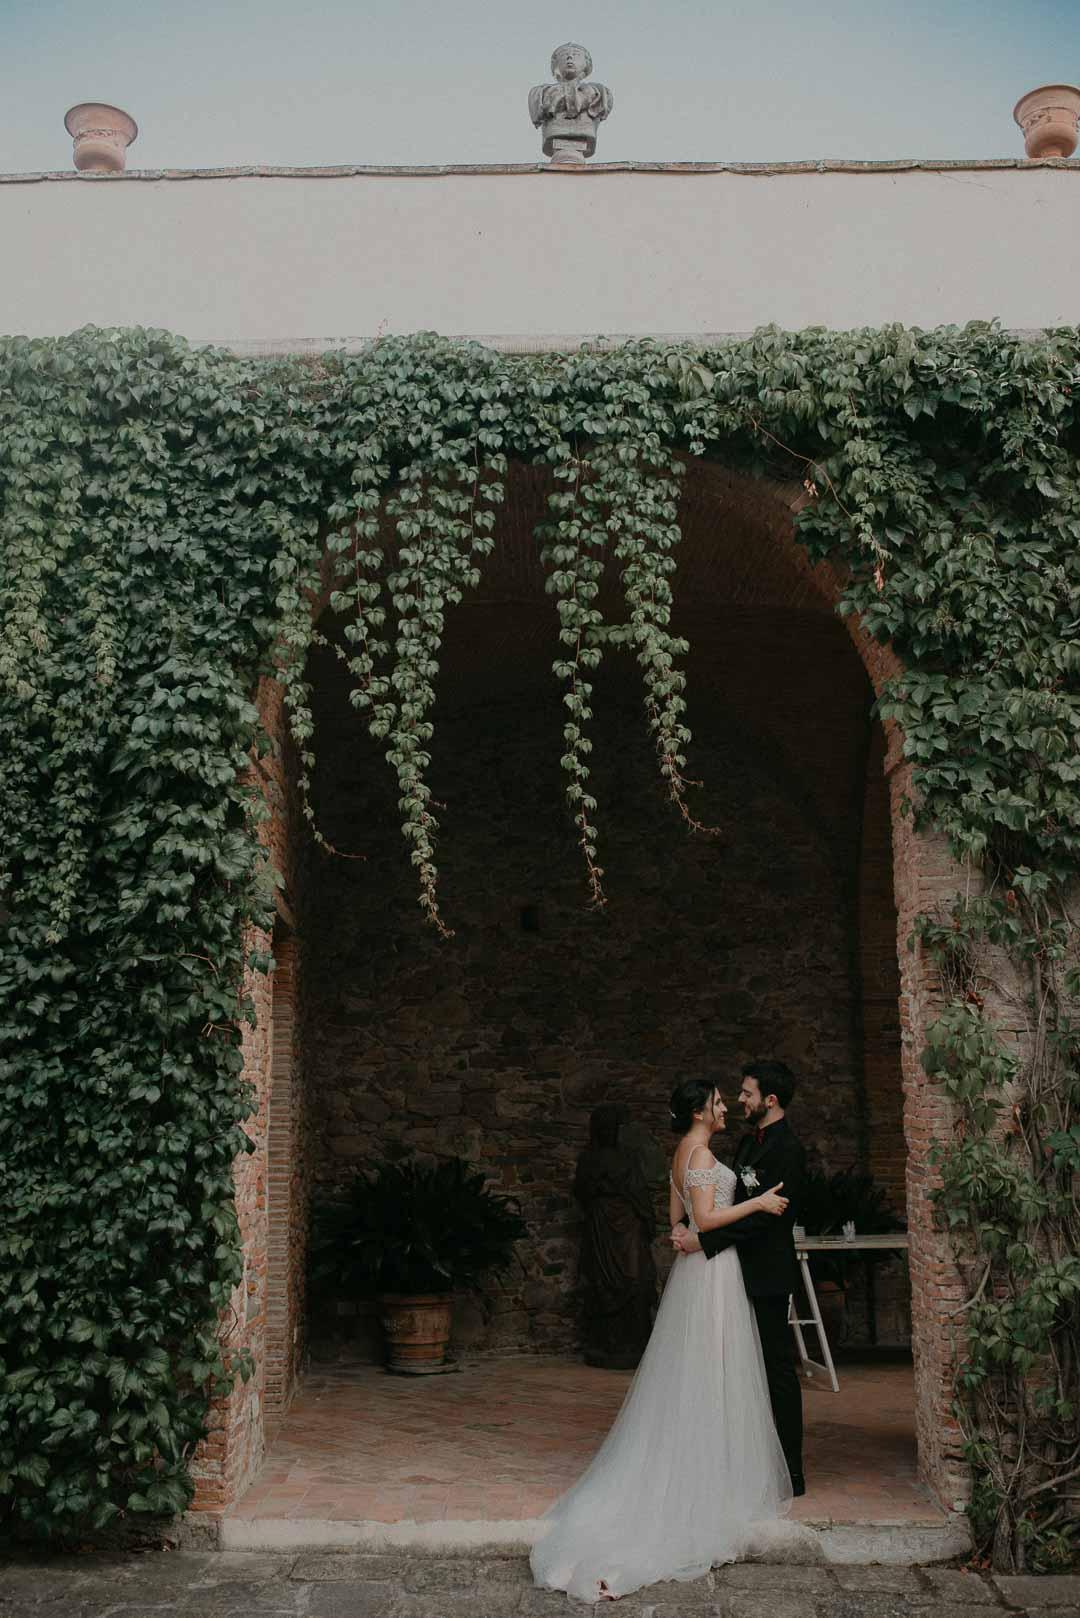 wedding-photographer-destination-fineart-bespoke-reportage-tuscany-villascorzi-vivianeizzo-spazio46-125